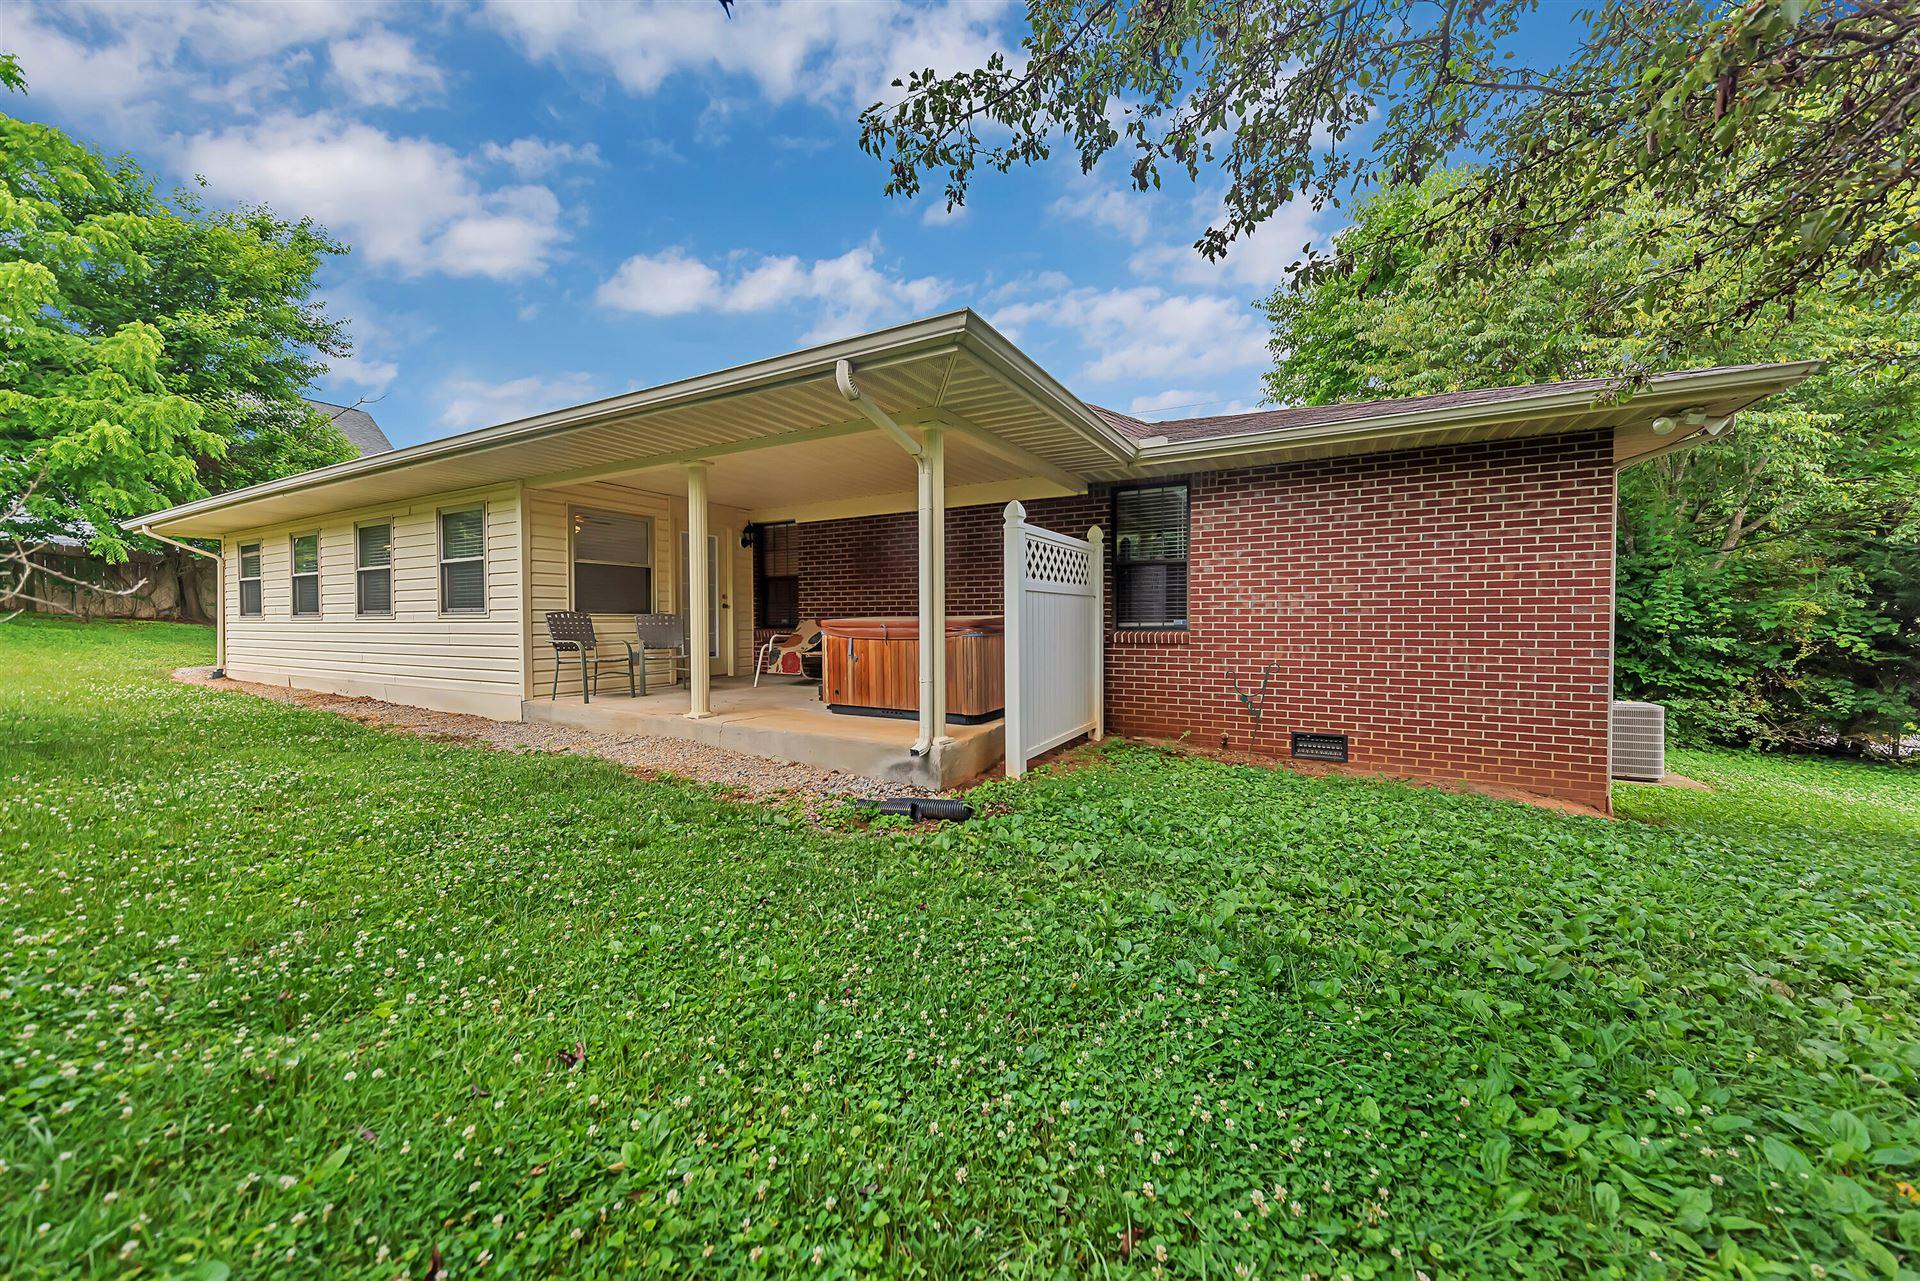 Photo of 1218 Bradshaw Garden Rd, Knoxville, TN 37912 (MLS # 1156220)